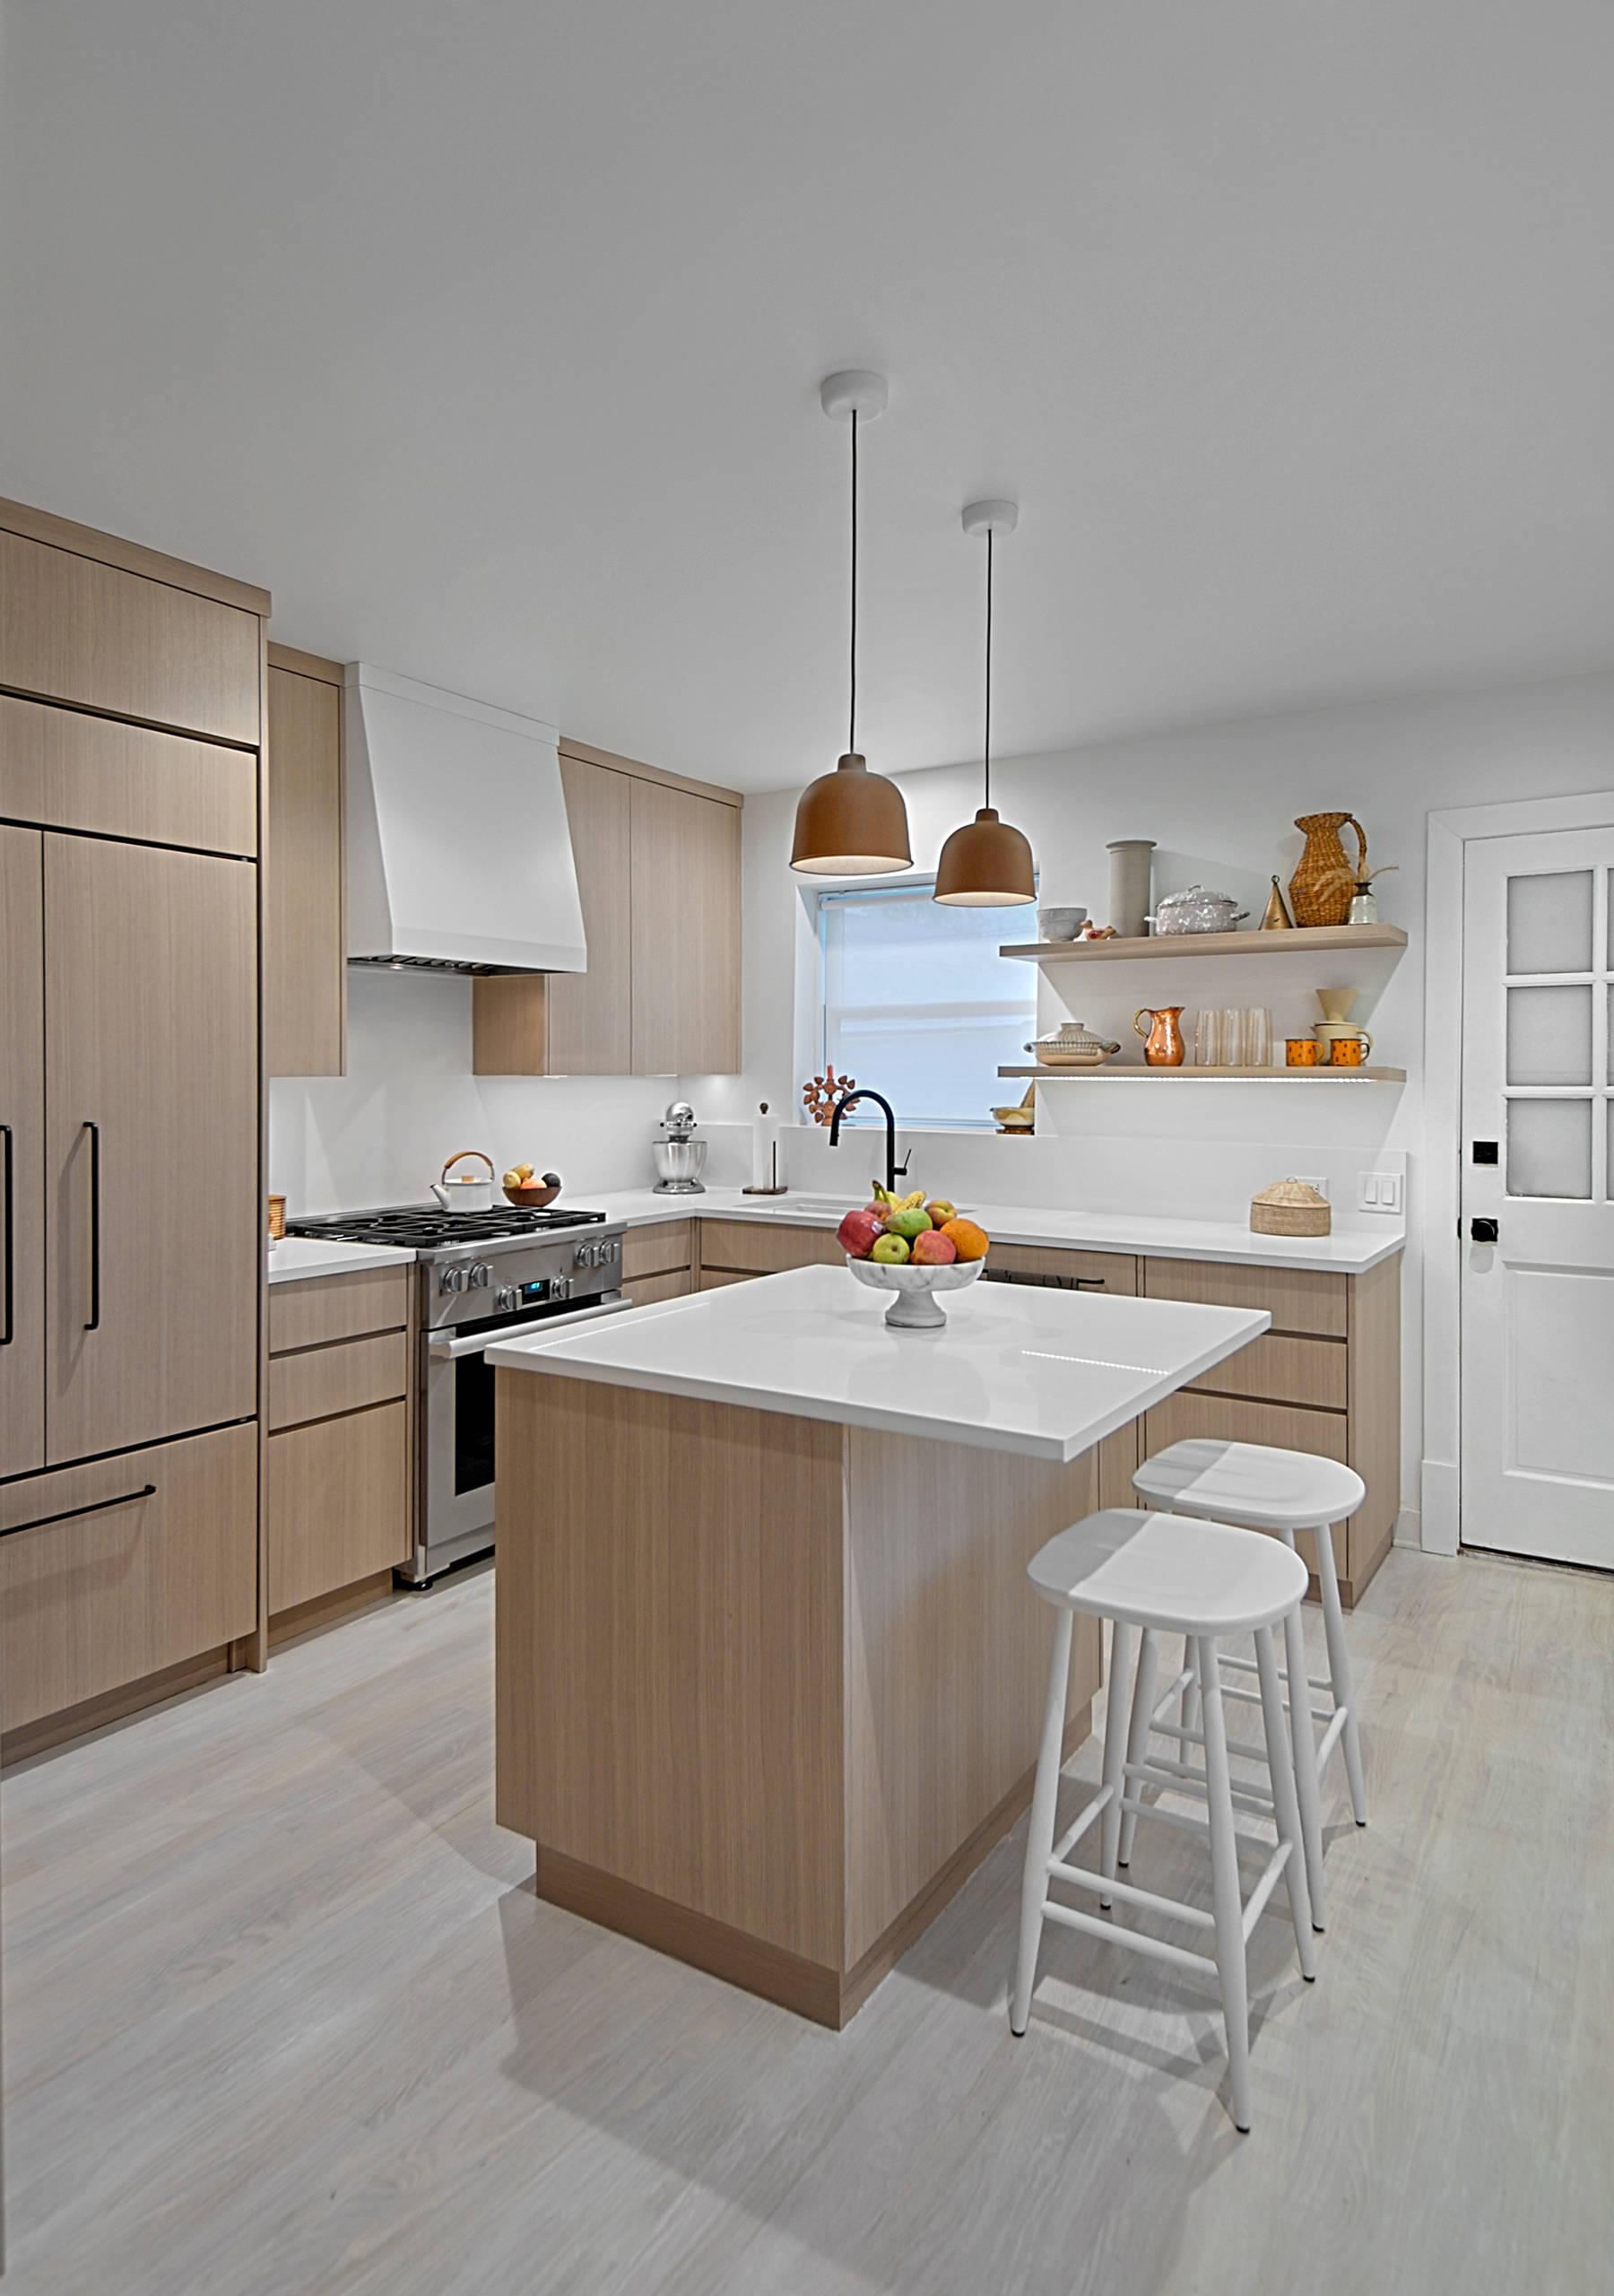 Remarkable Kitchen With Light Cabinets Ideas   Kerangka Gambar